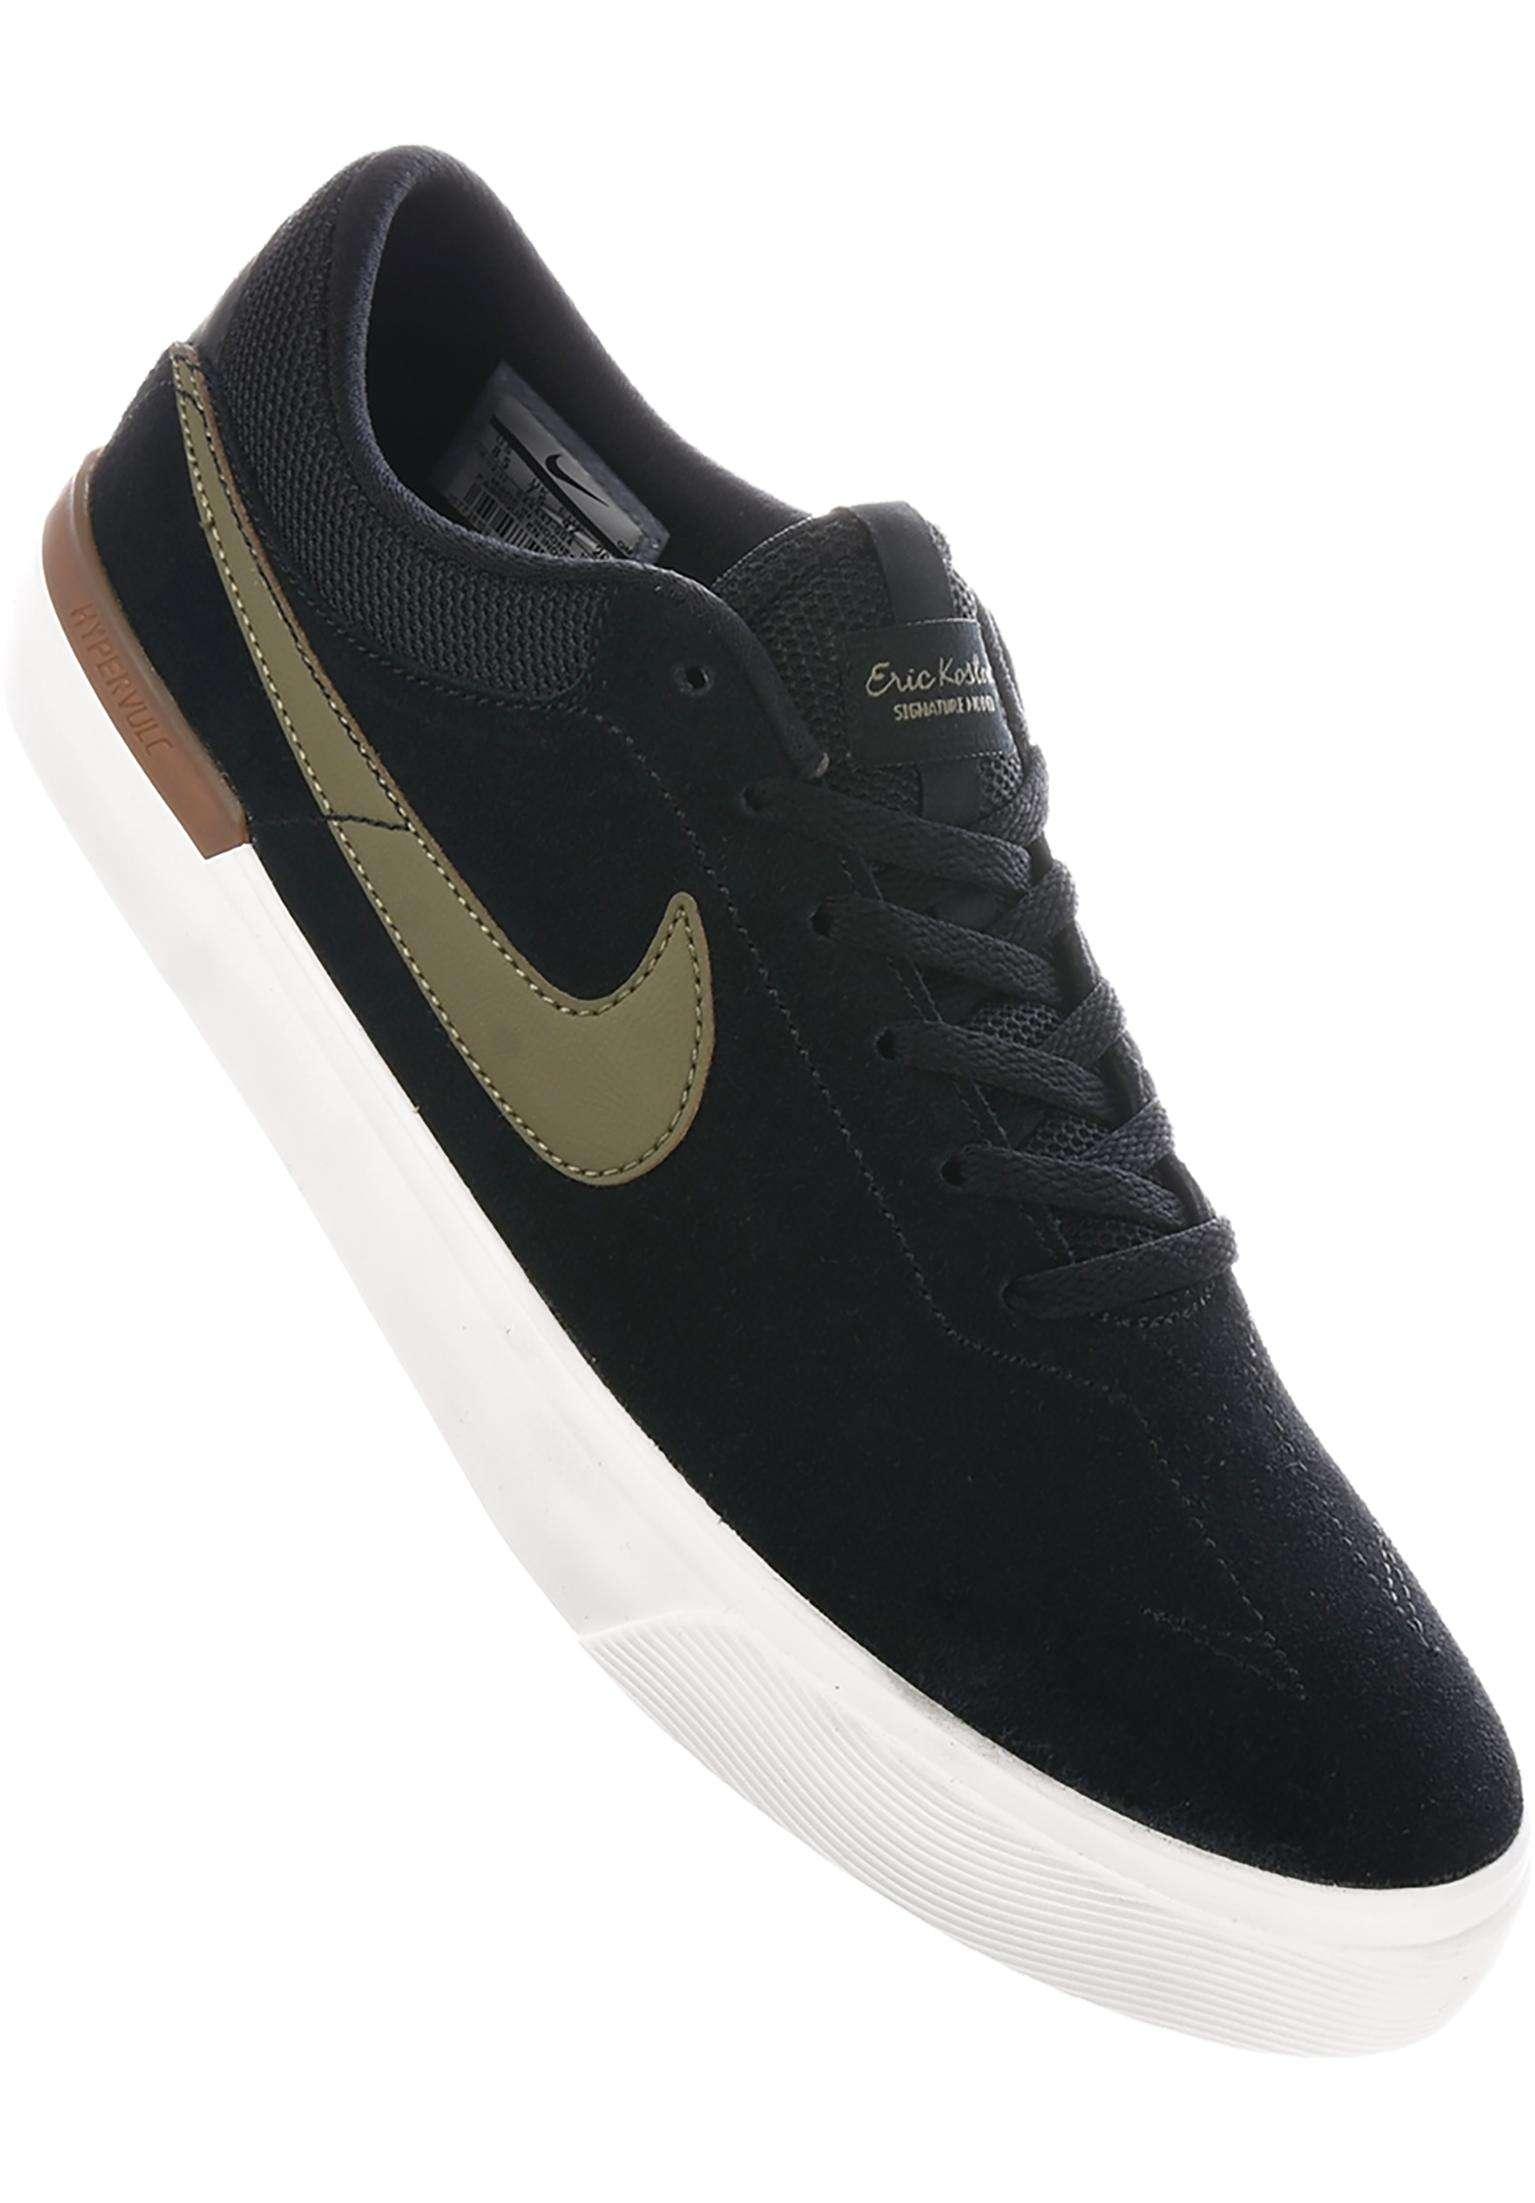 36ddecae0995 Koston Hypervulc Nike SB All Shoes in black-mediumolive for Men